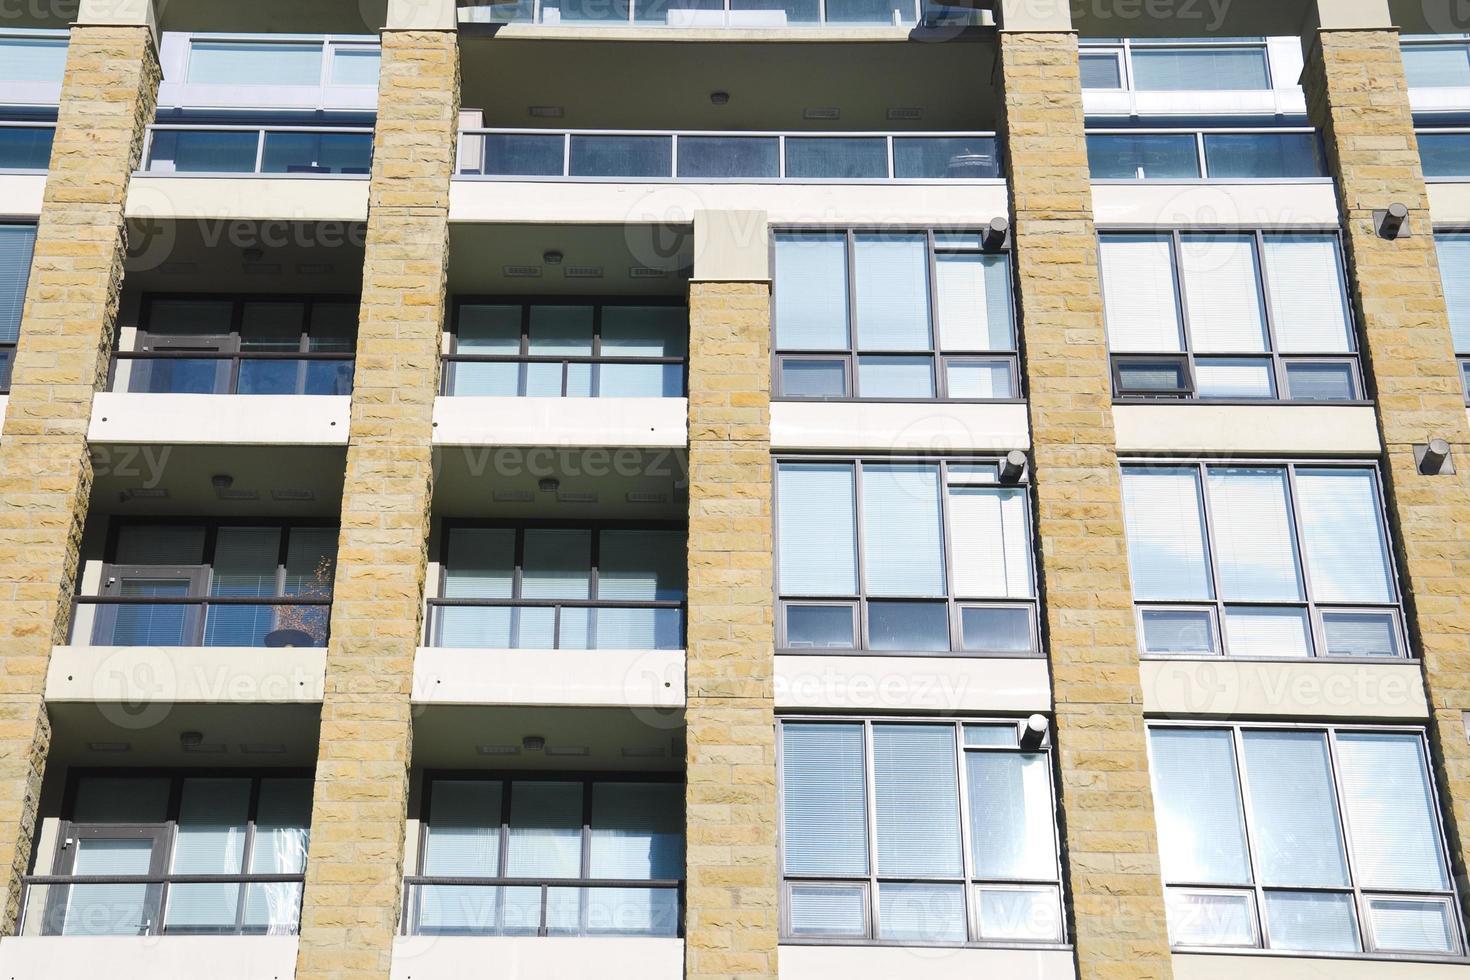 vivienda de bajos ingresos foto